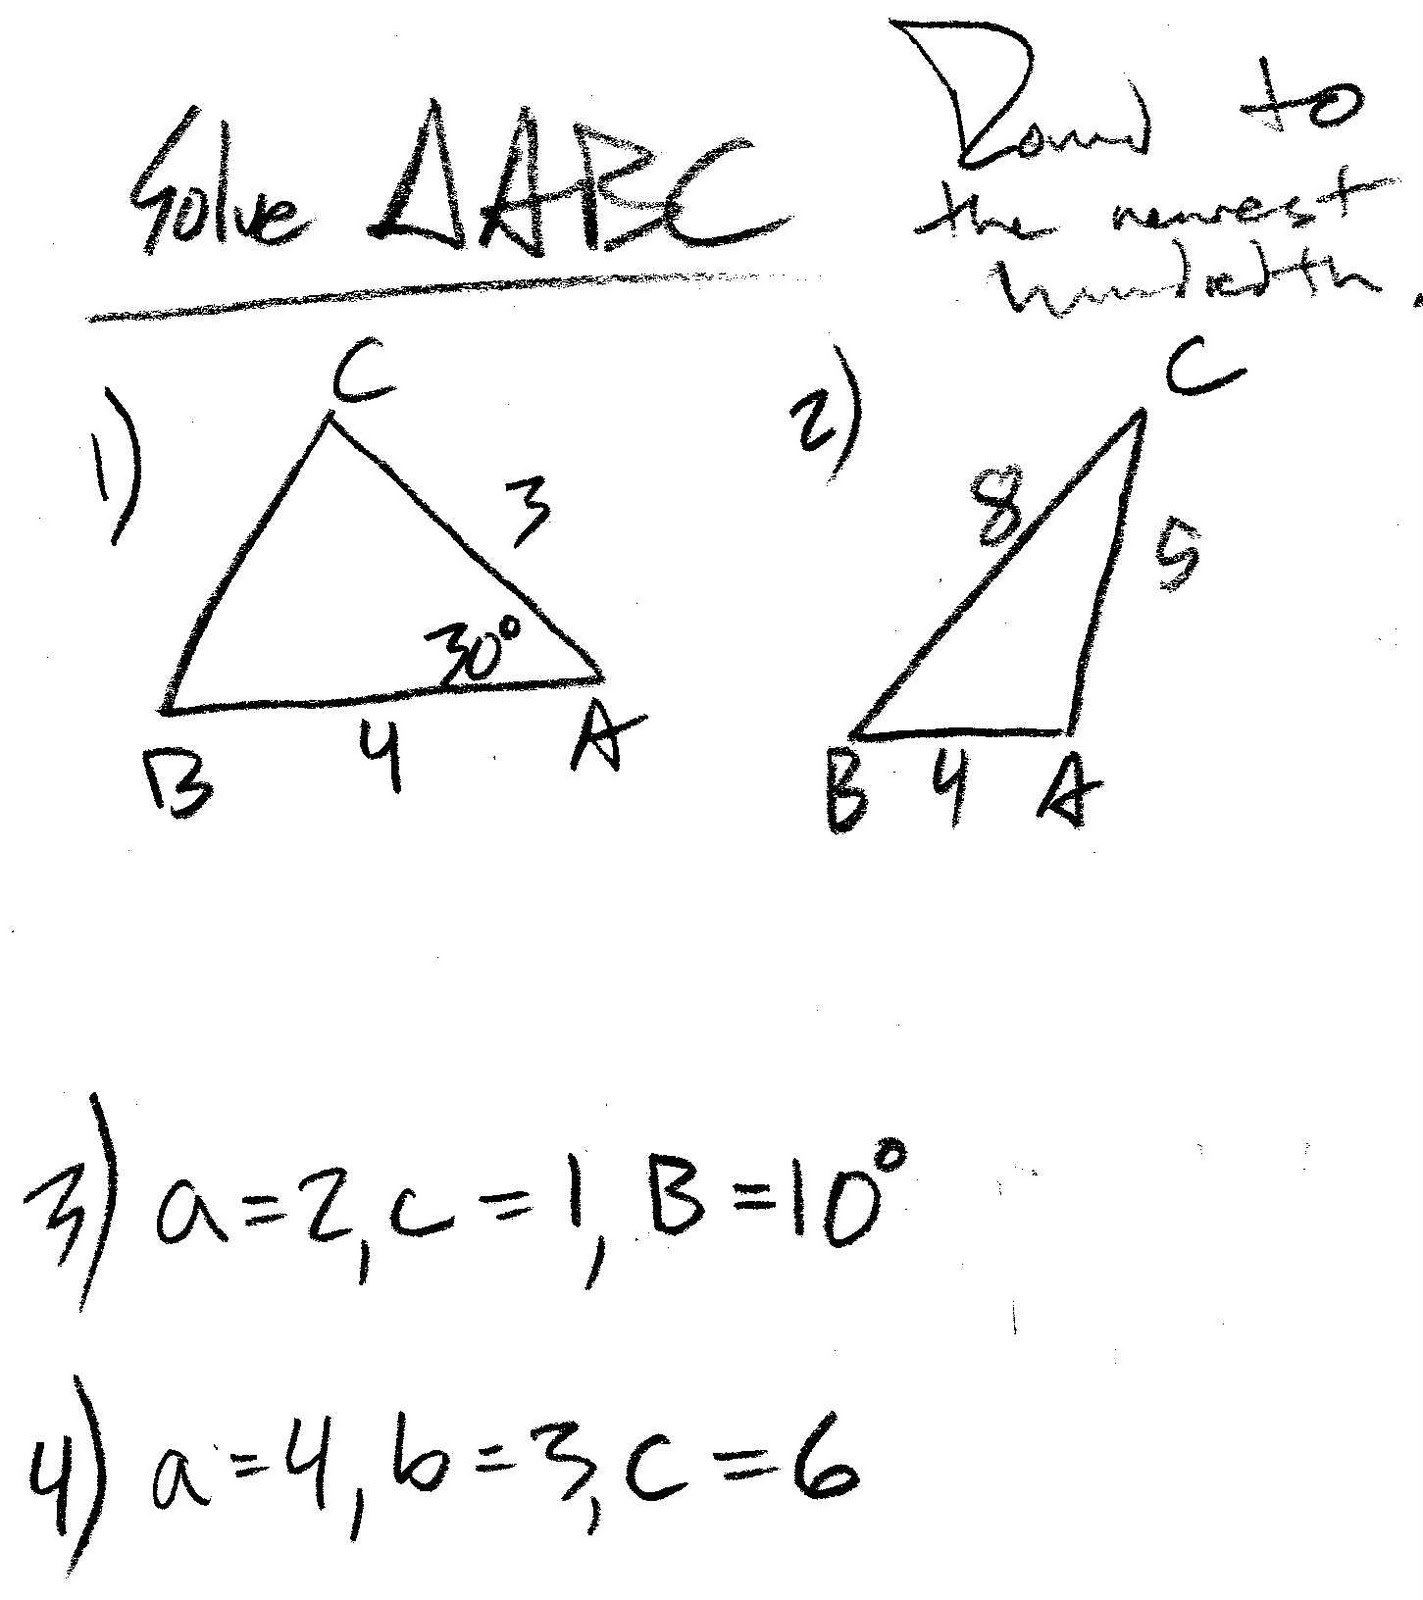 Mr. Suominen's Math Homepage: College Mathematics